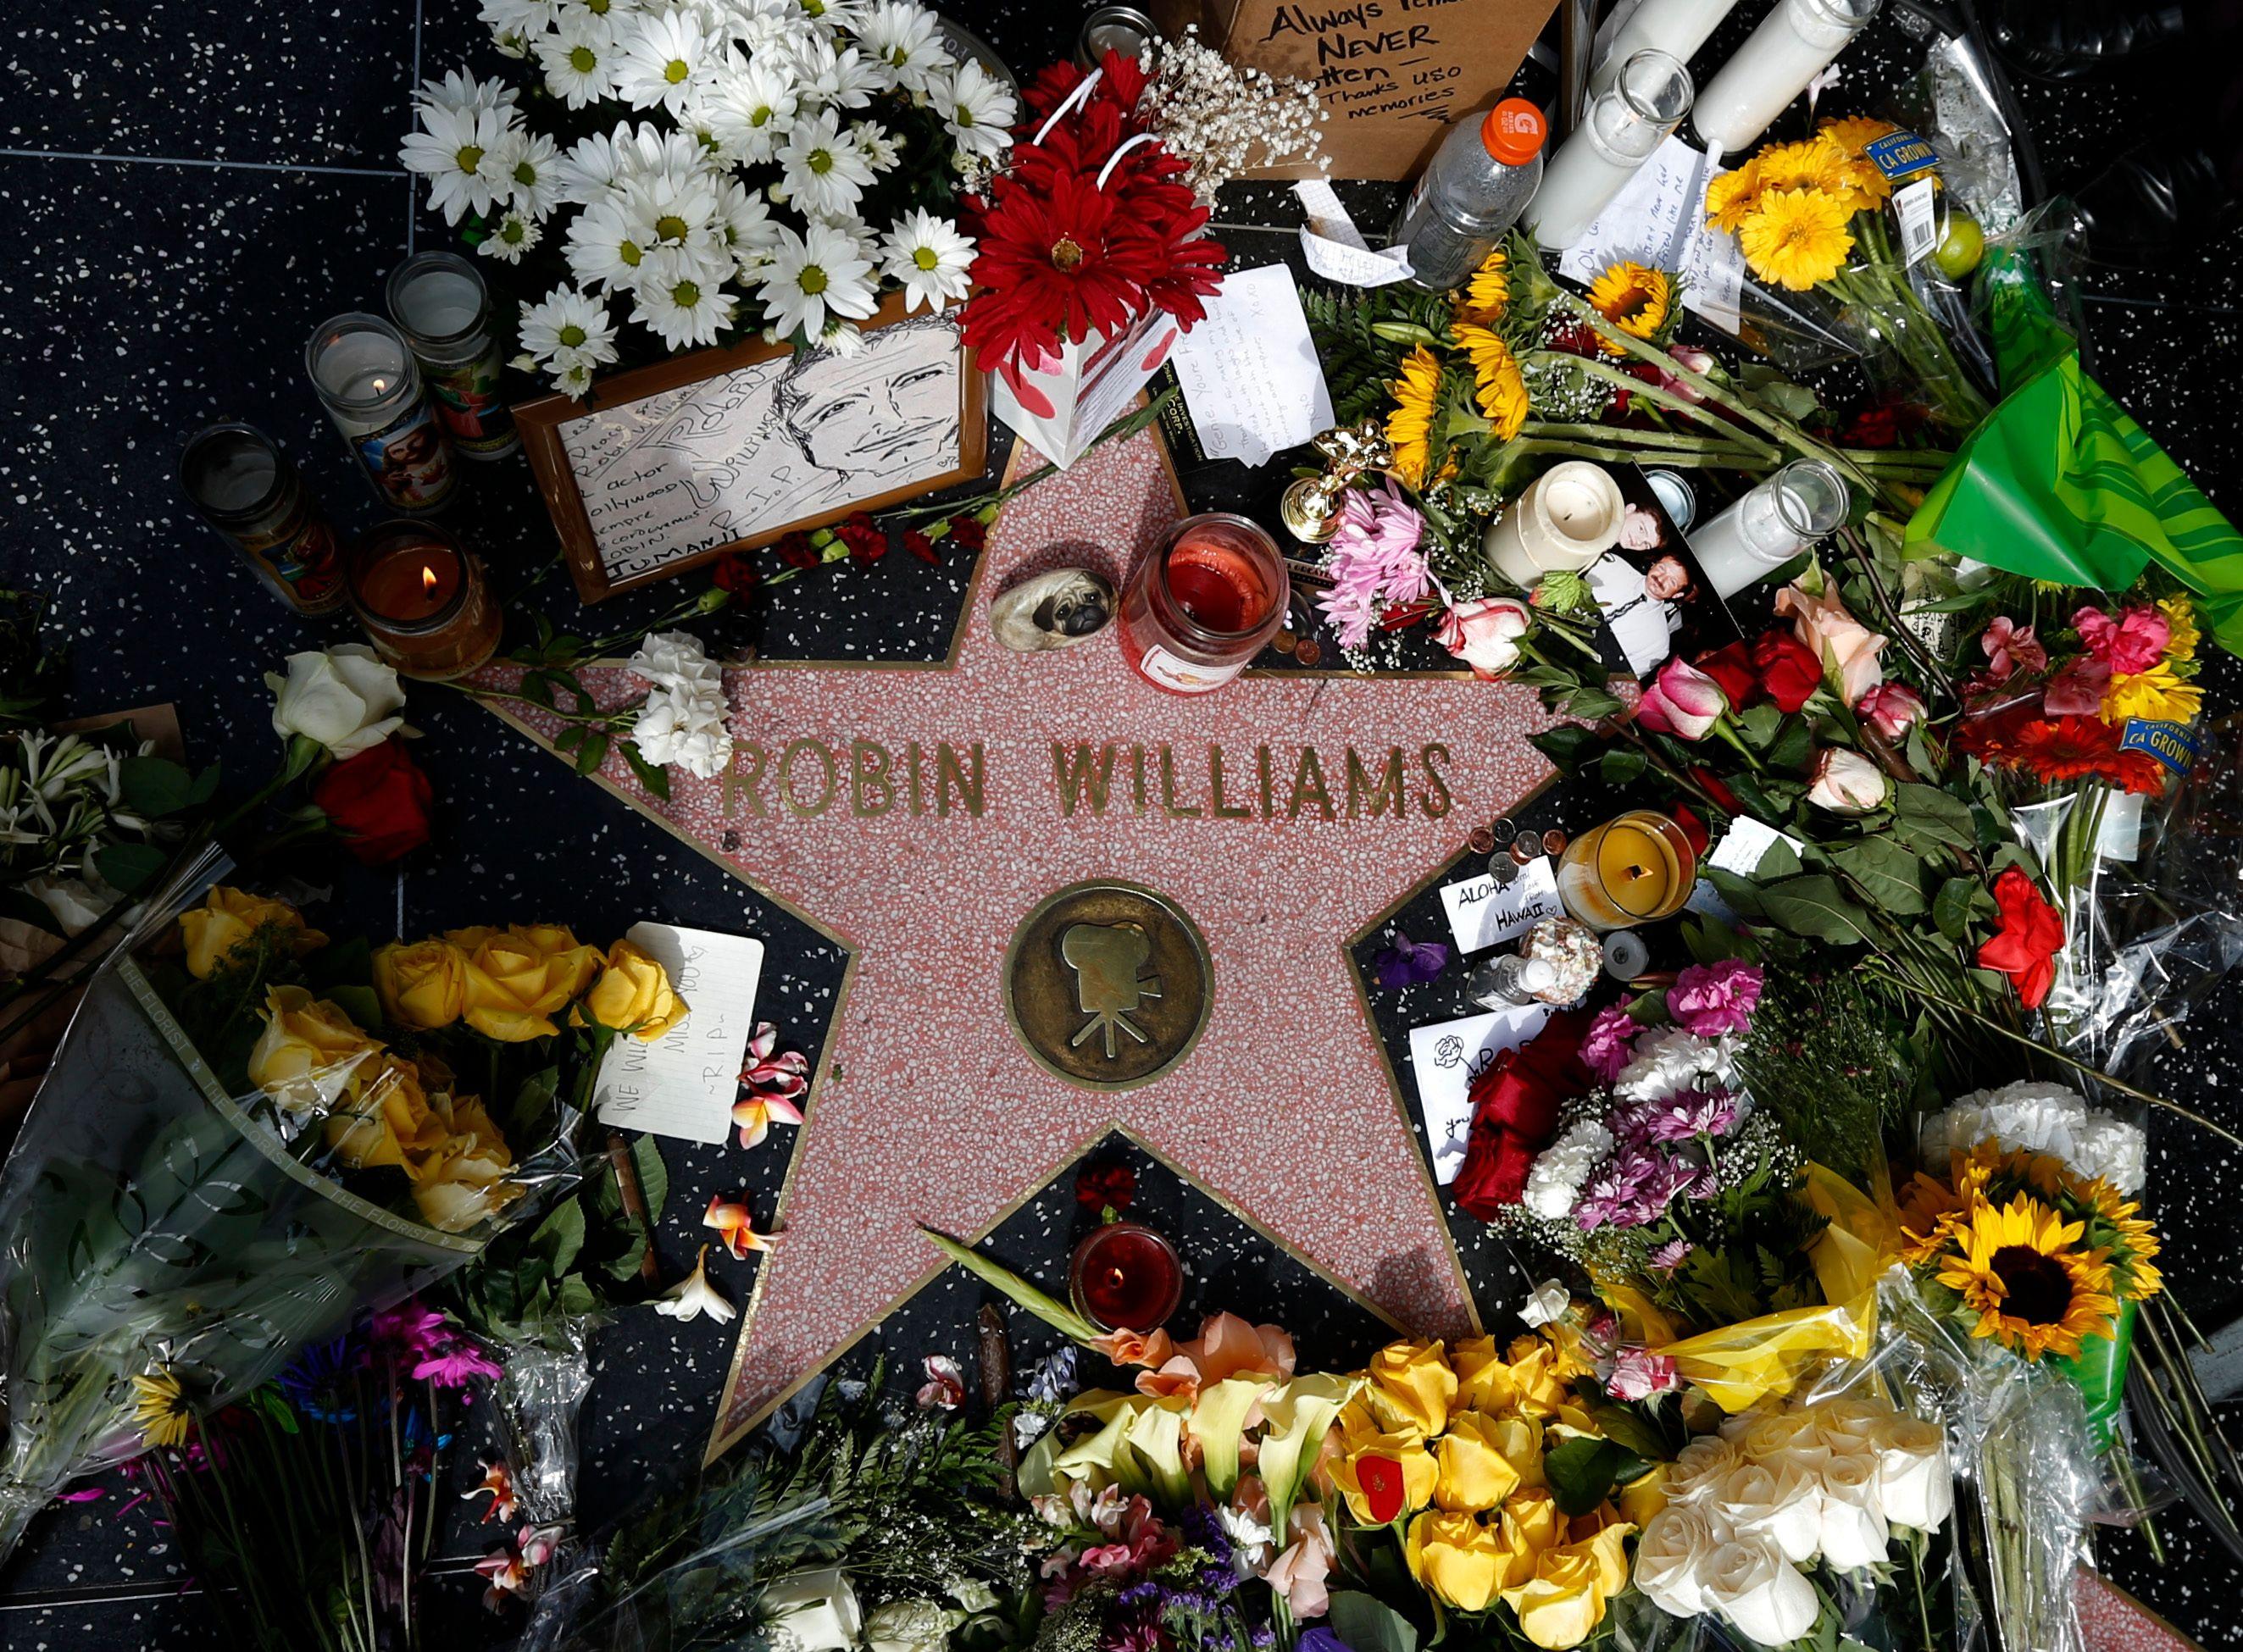 Retrouvé mort chez lui ce lundi 11 août, l'acteur et humoriste américain Robin Williams se serait pendu